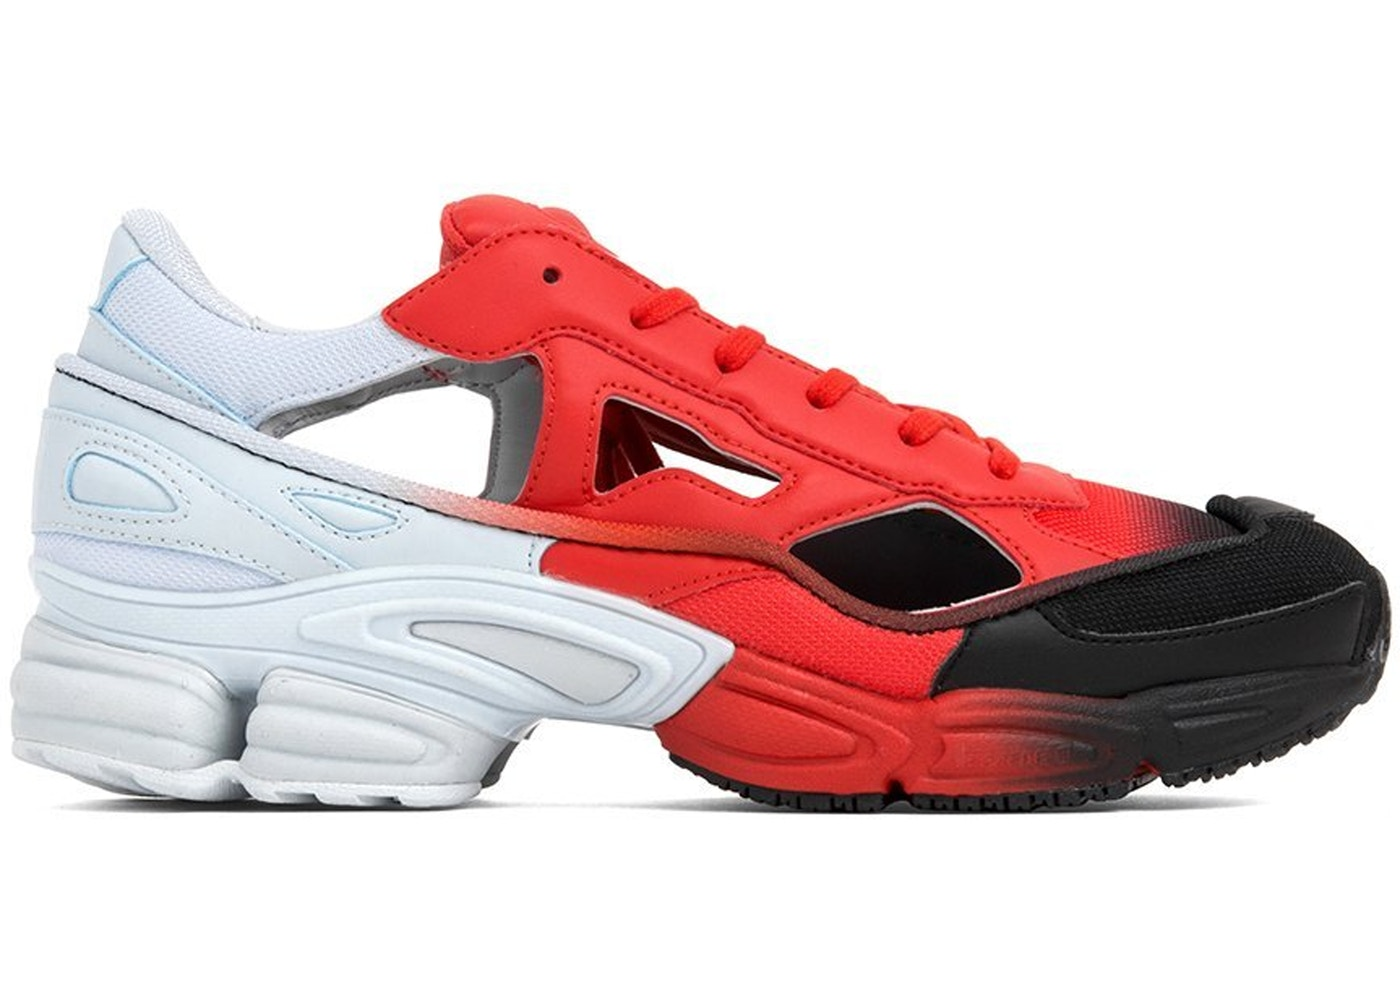 cheaper 799cd 7e4a3 adidas Replicant Ozweego Raf Simons Halo Blue Red